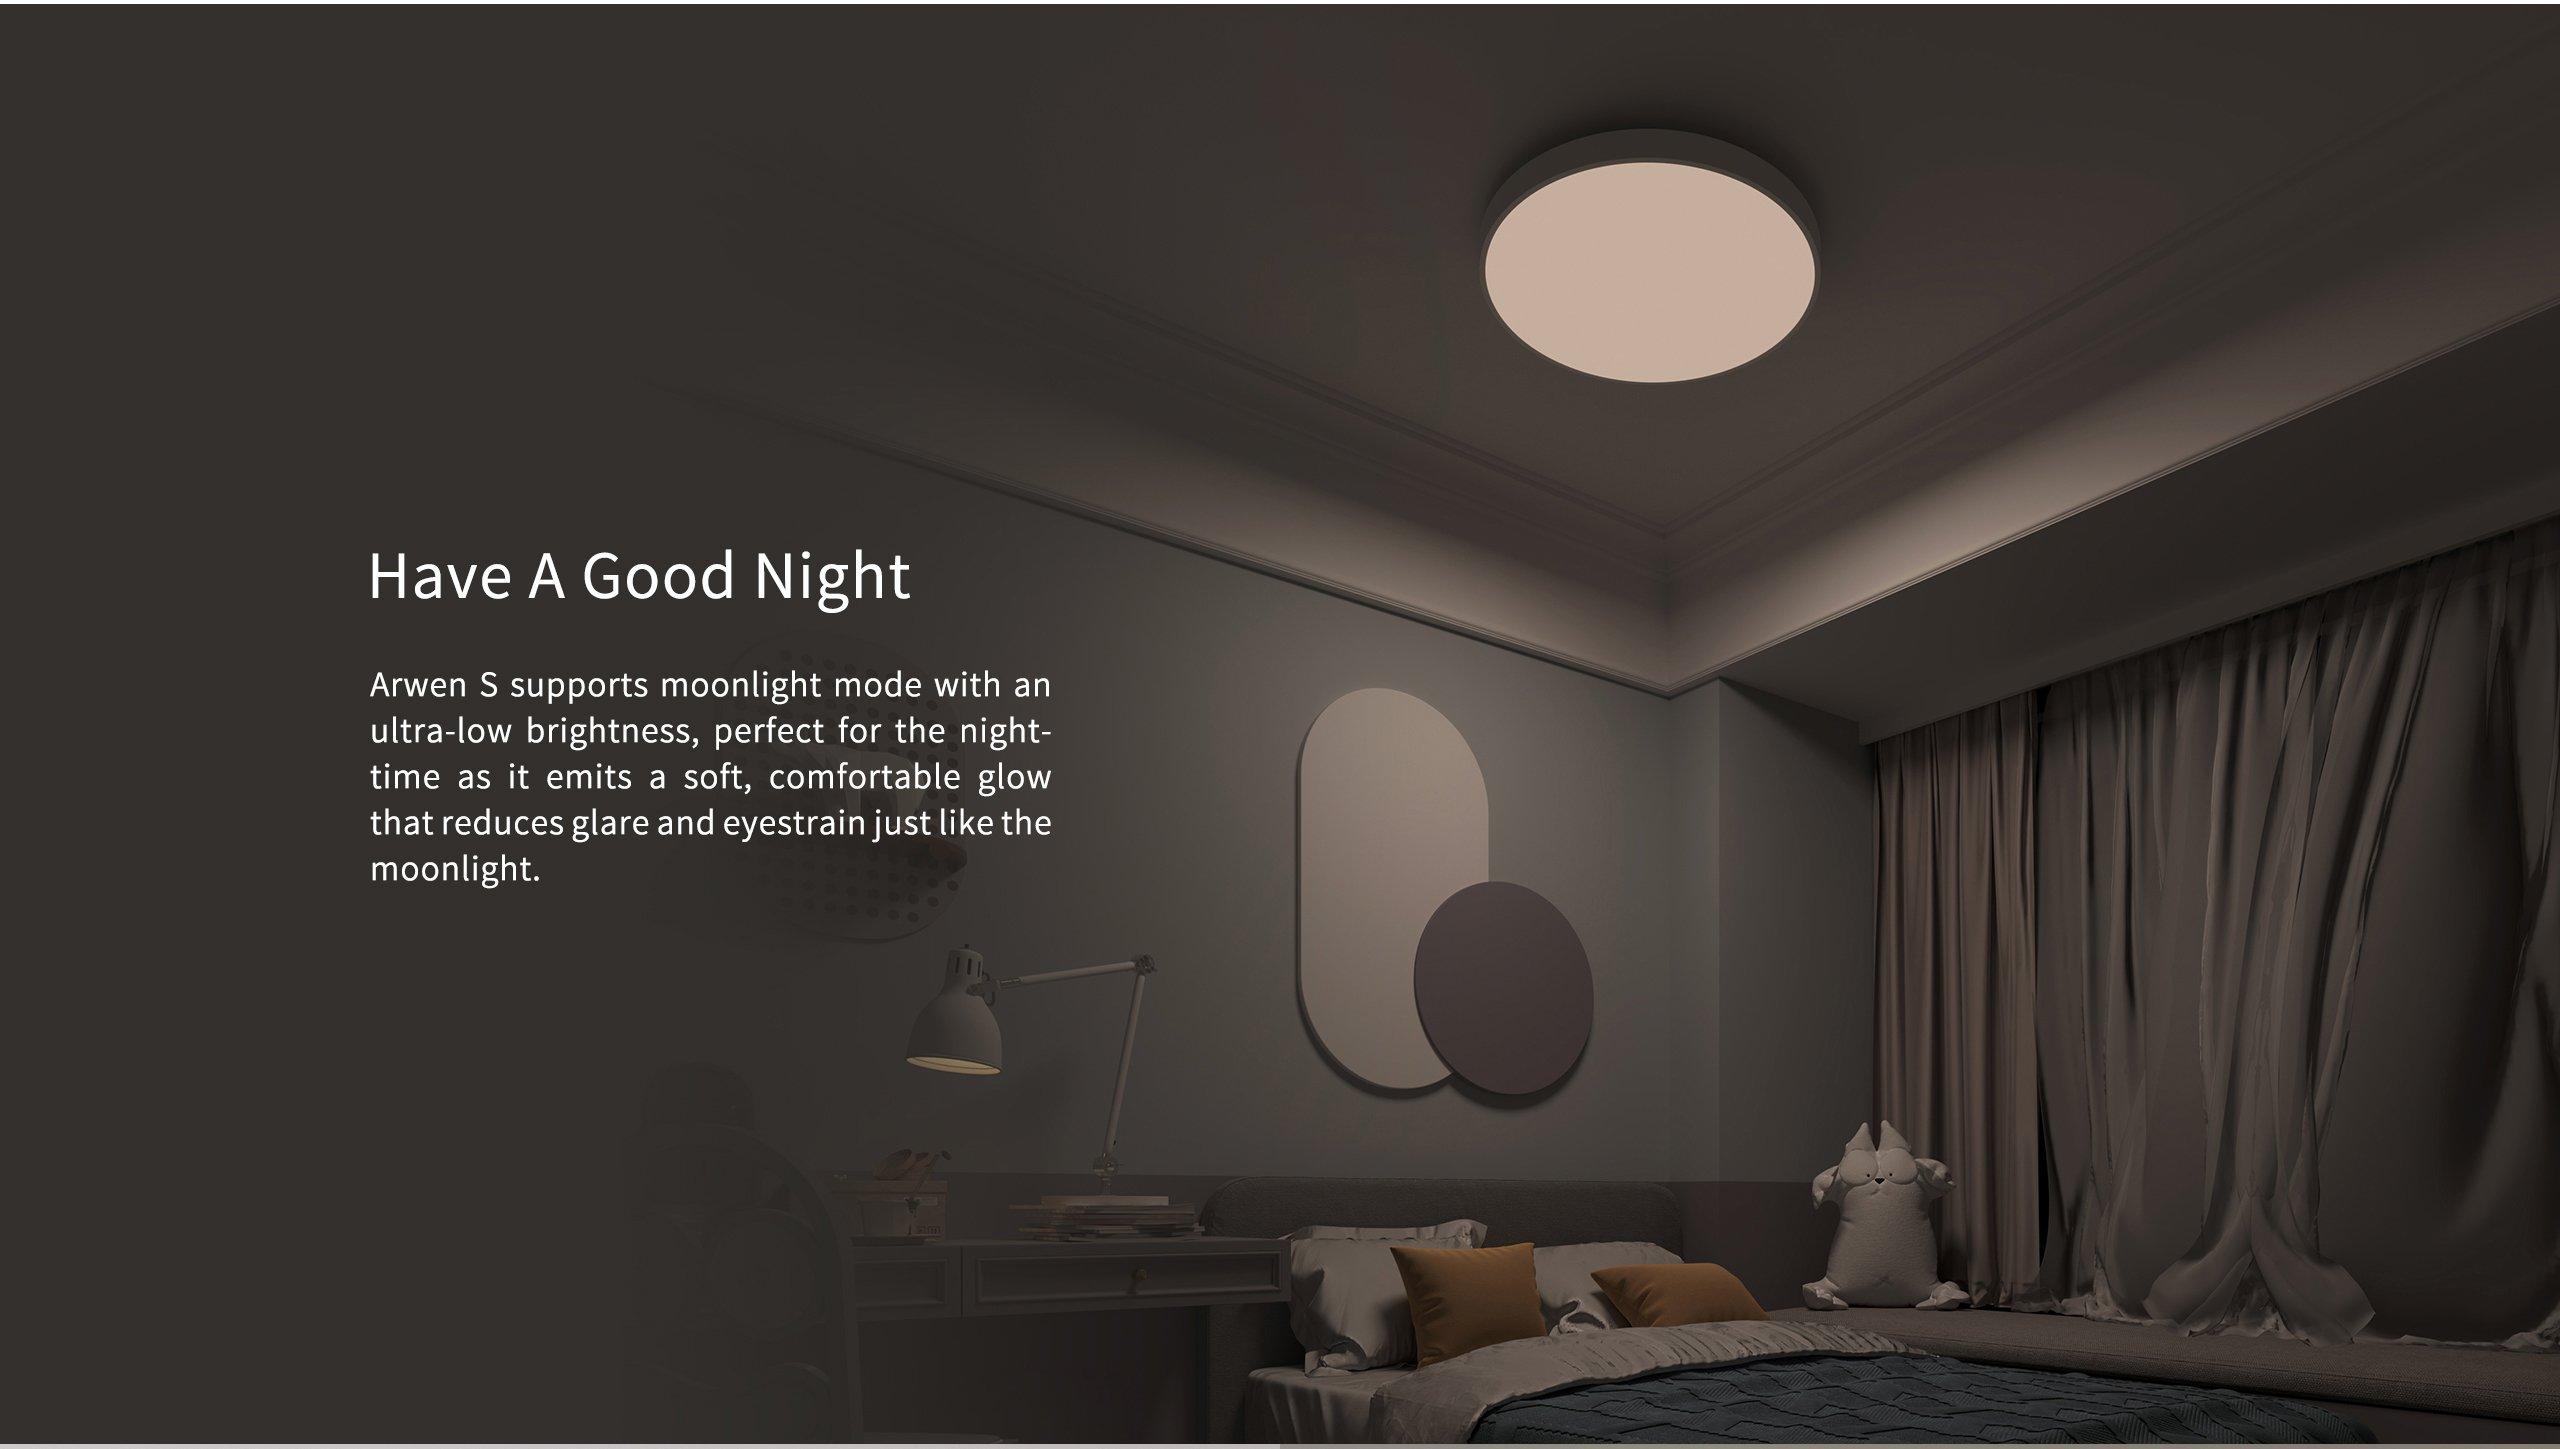 Mode nuit Yeelight Arwen Smart LED